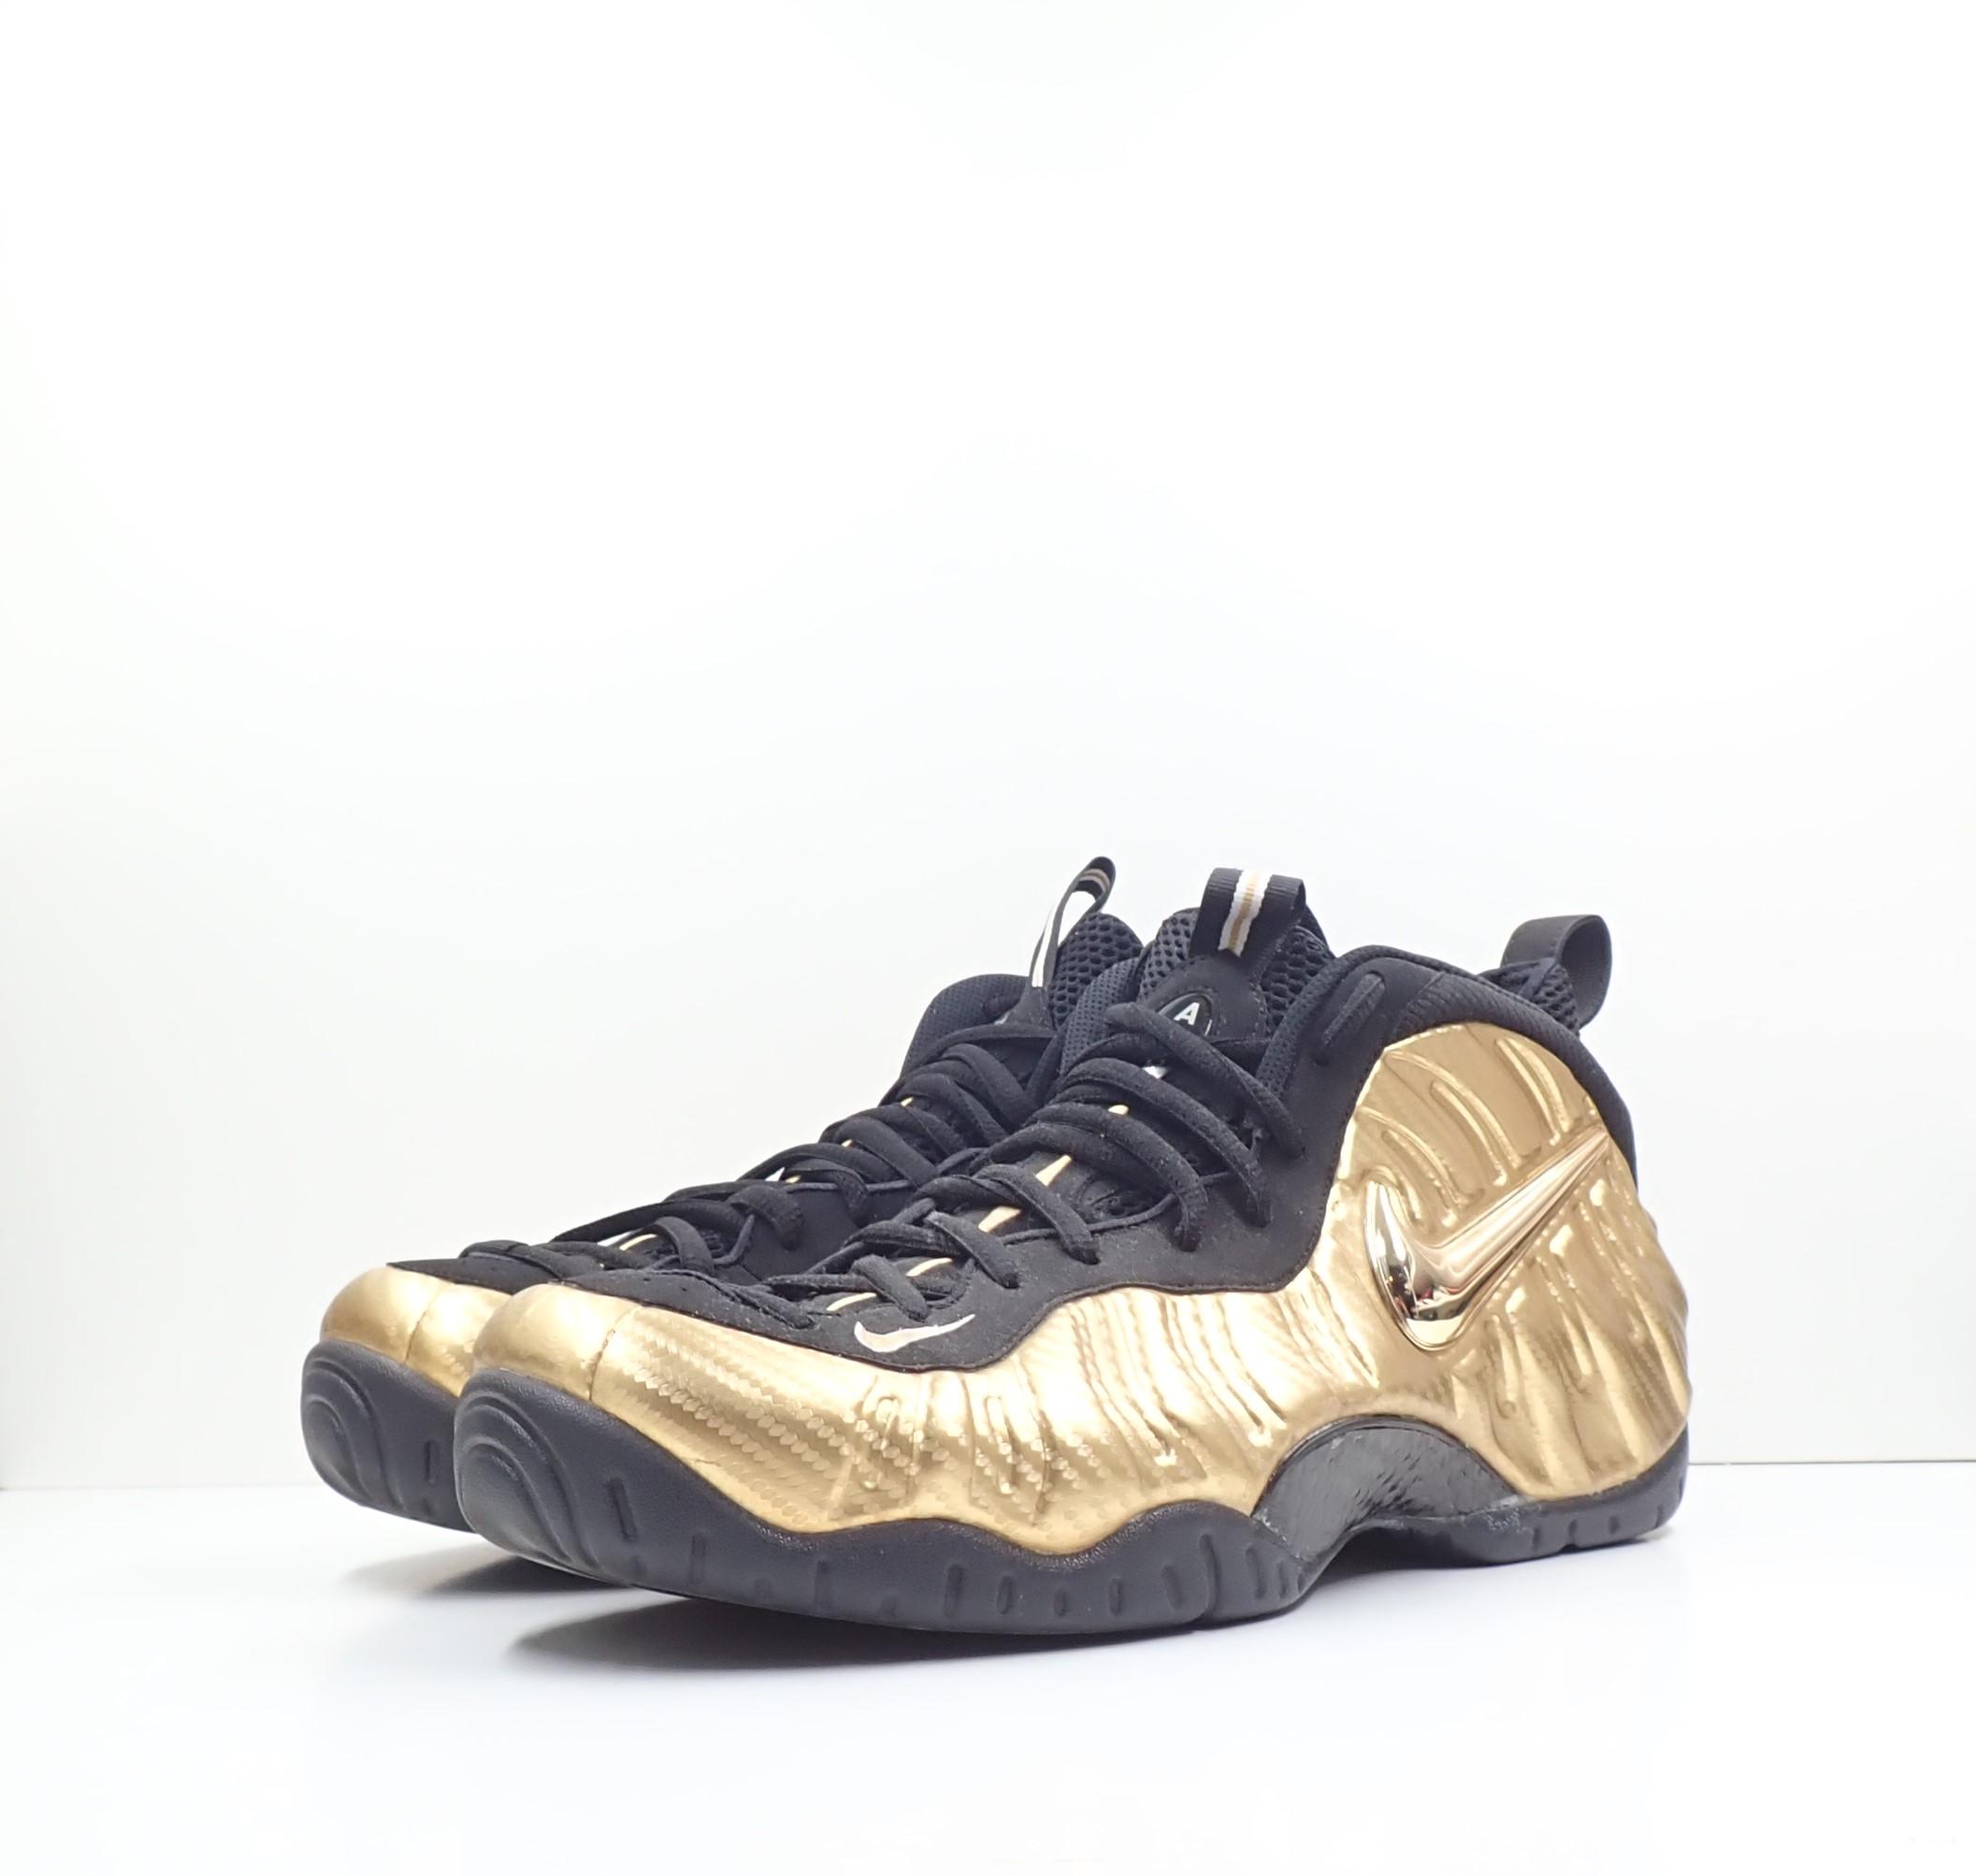 Nike Air Foamposite Pro Metallic Gold